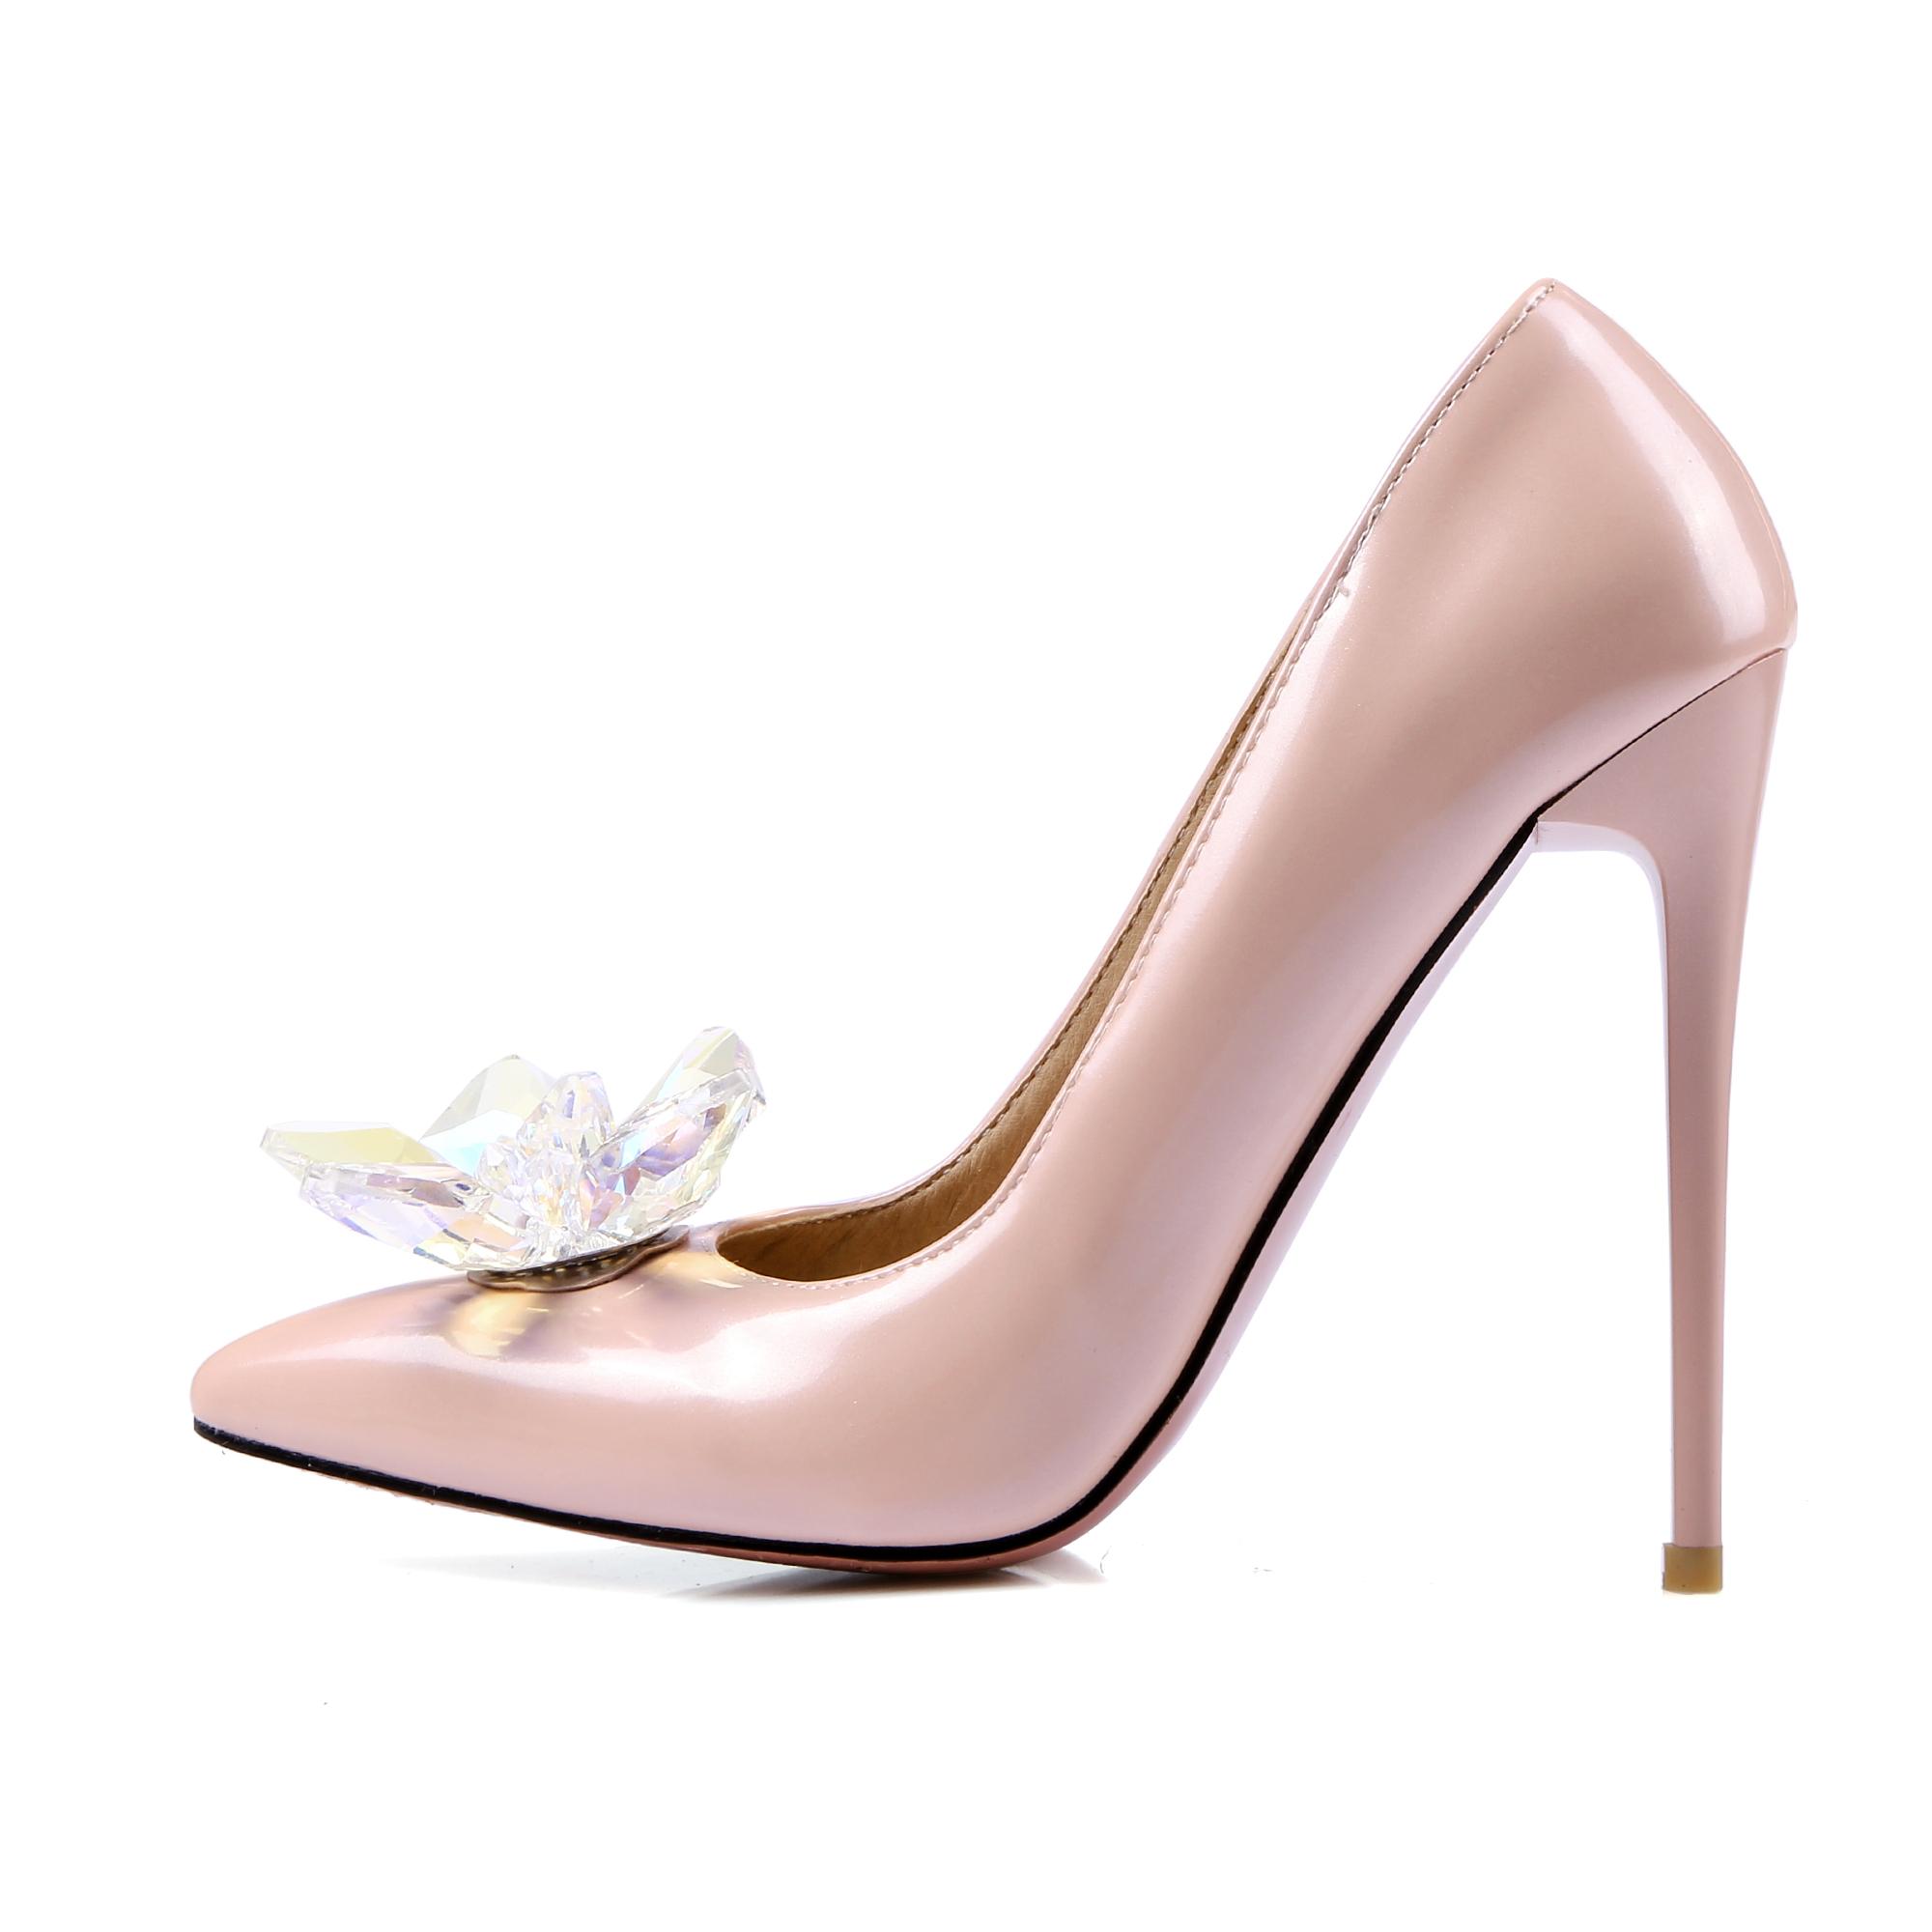 Us 36 2018 Spring Autumn Fashion Shoes Crystal Rhinestone Flowers